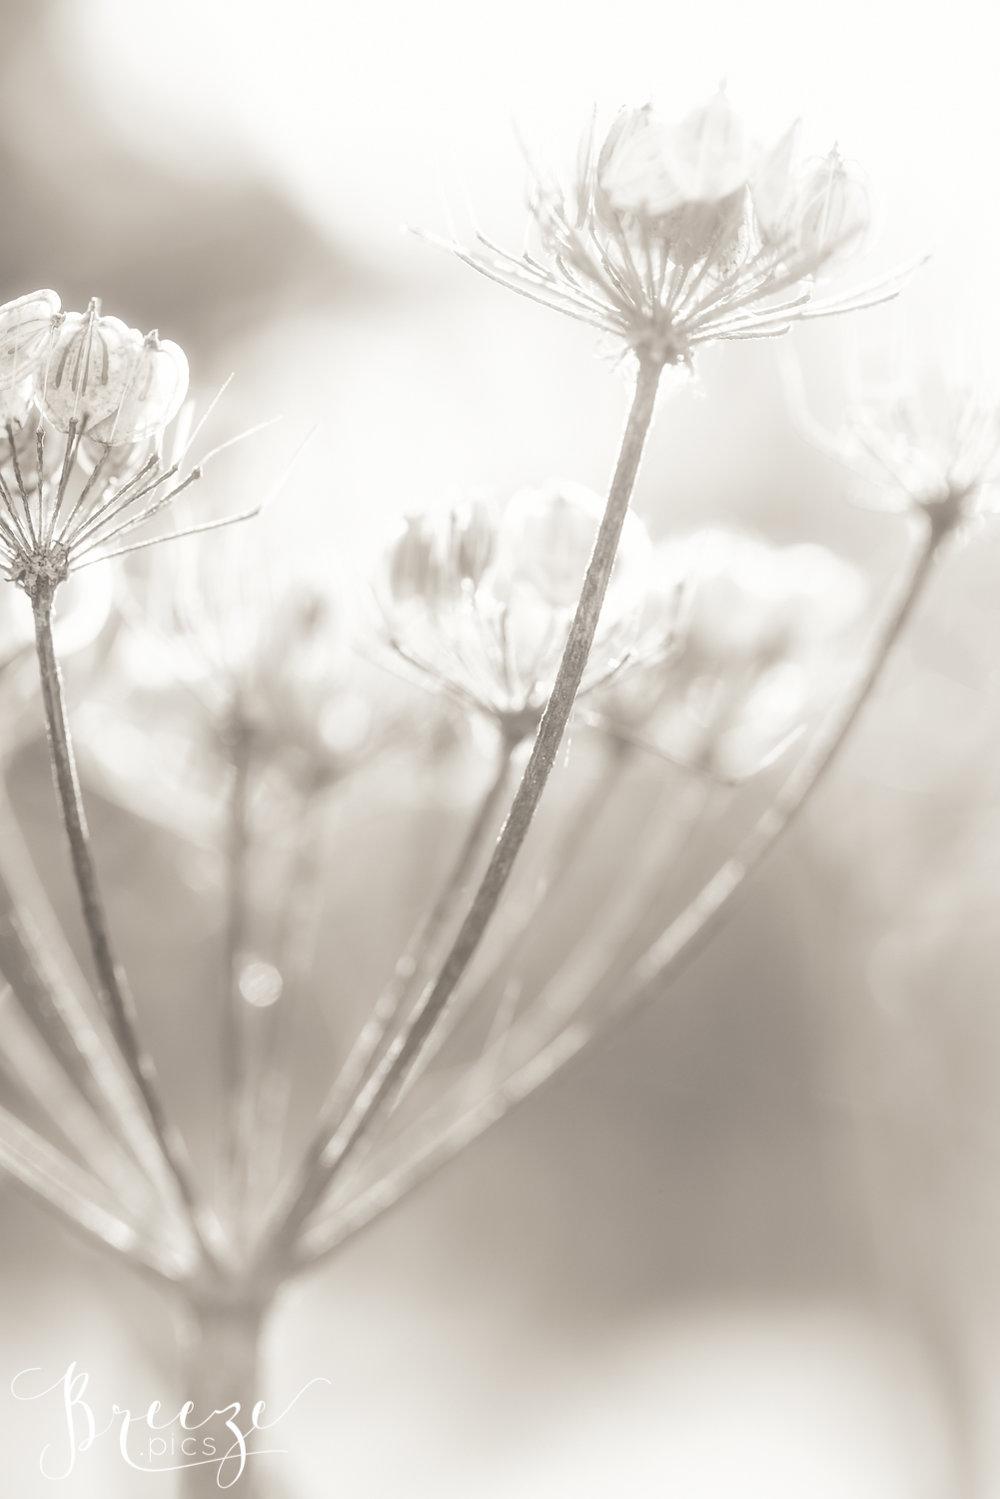 Whispy_Seeds_10.jpg